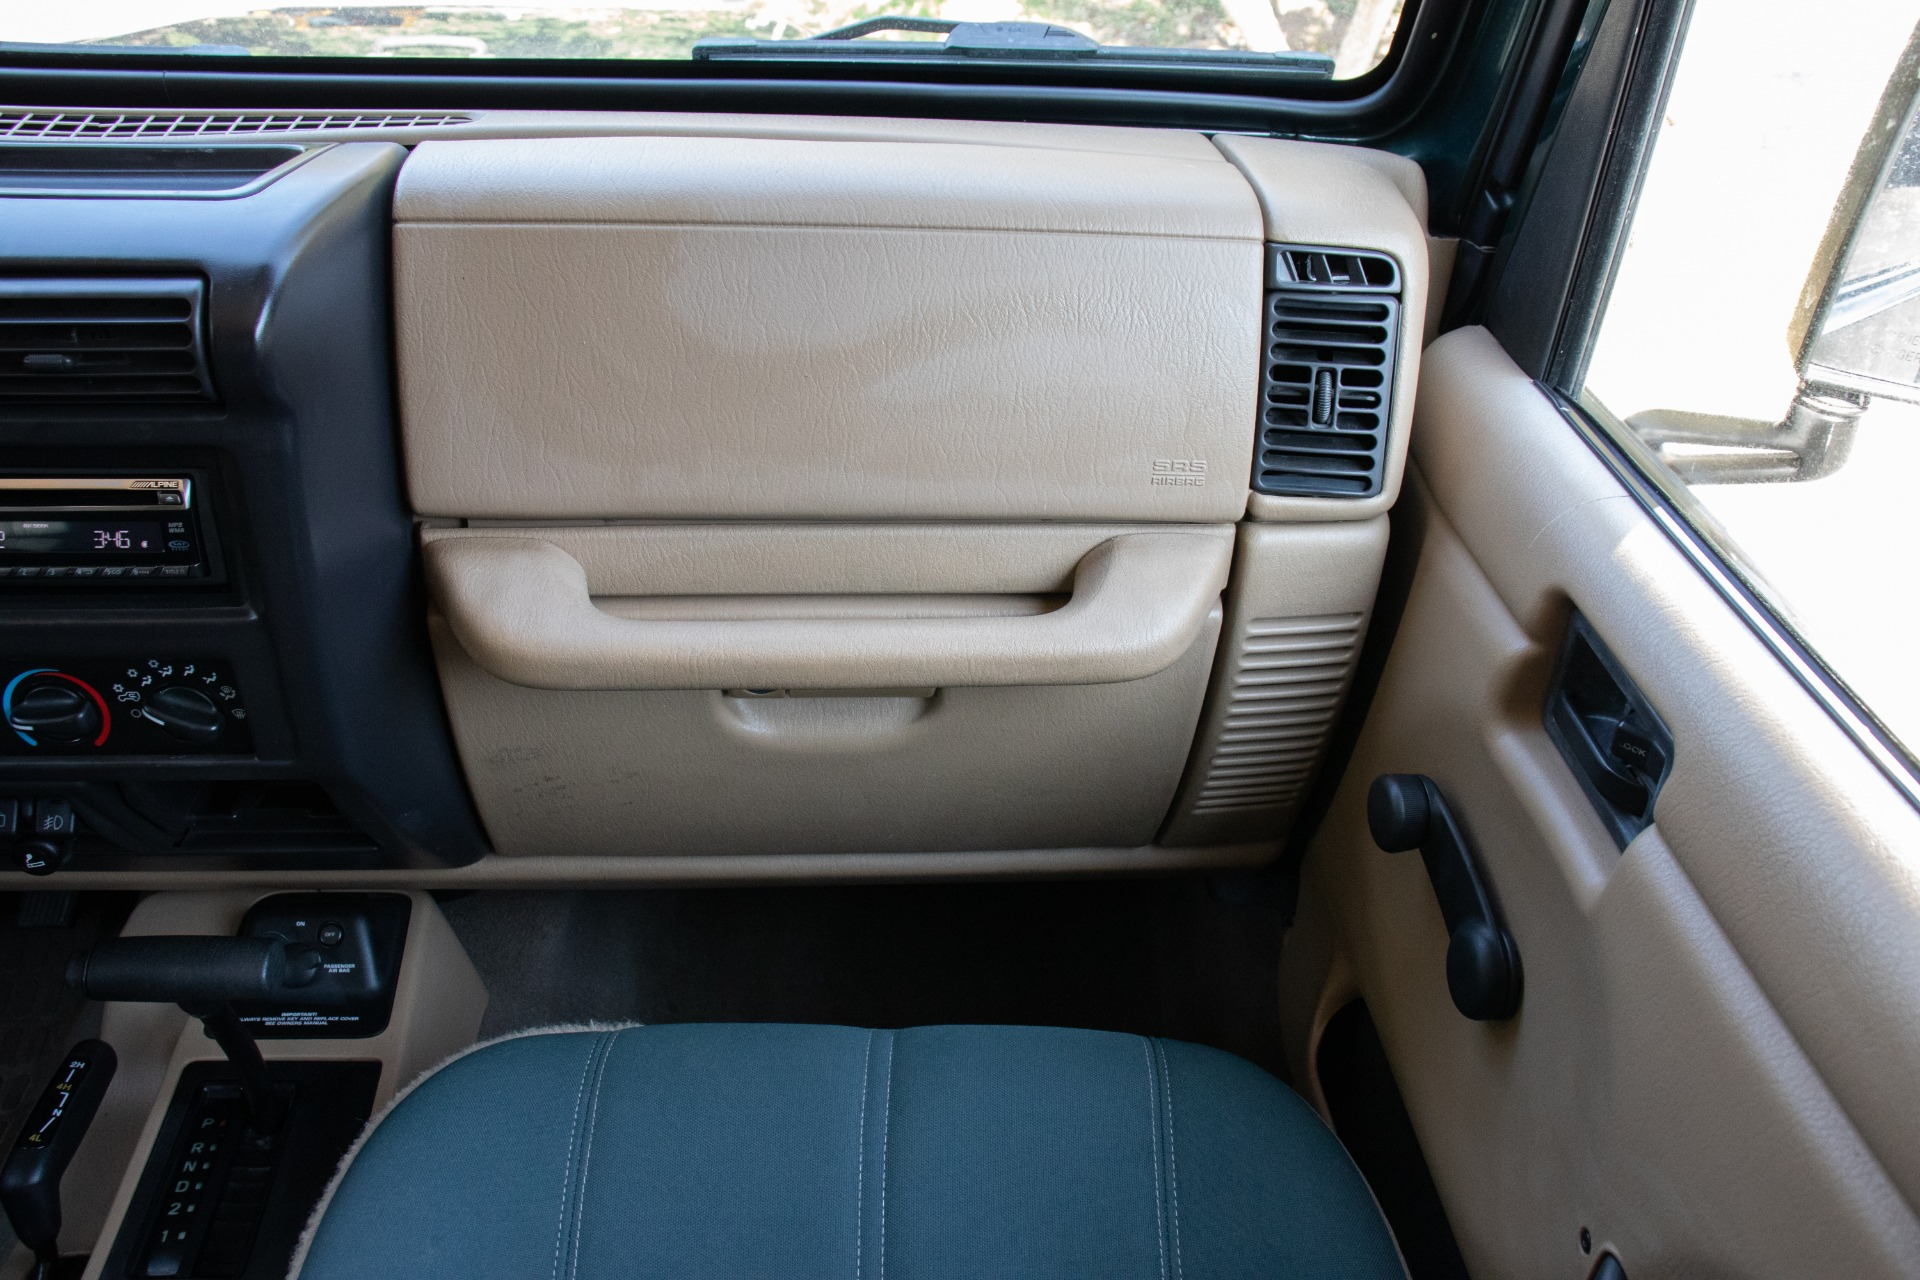 Used 2000 Jeep Wrangler Sahara For Sale 16 995 Select Jeeps Inc Stock 728360